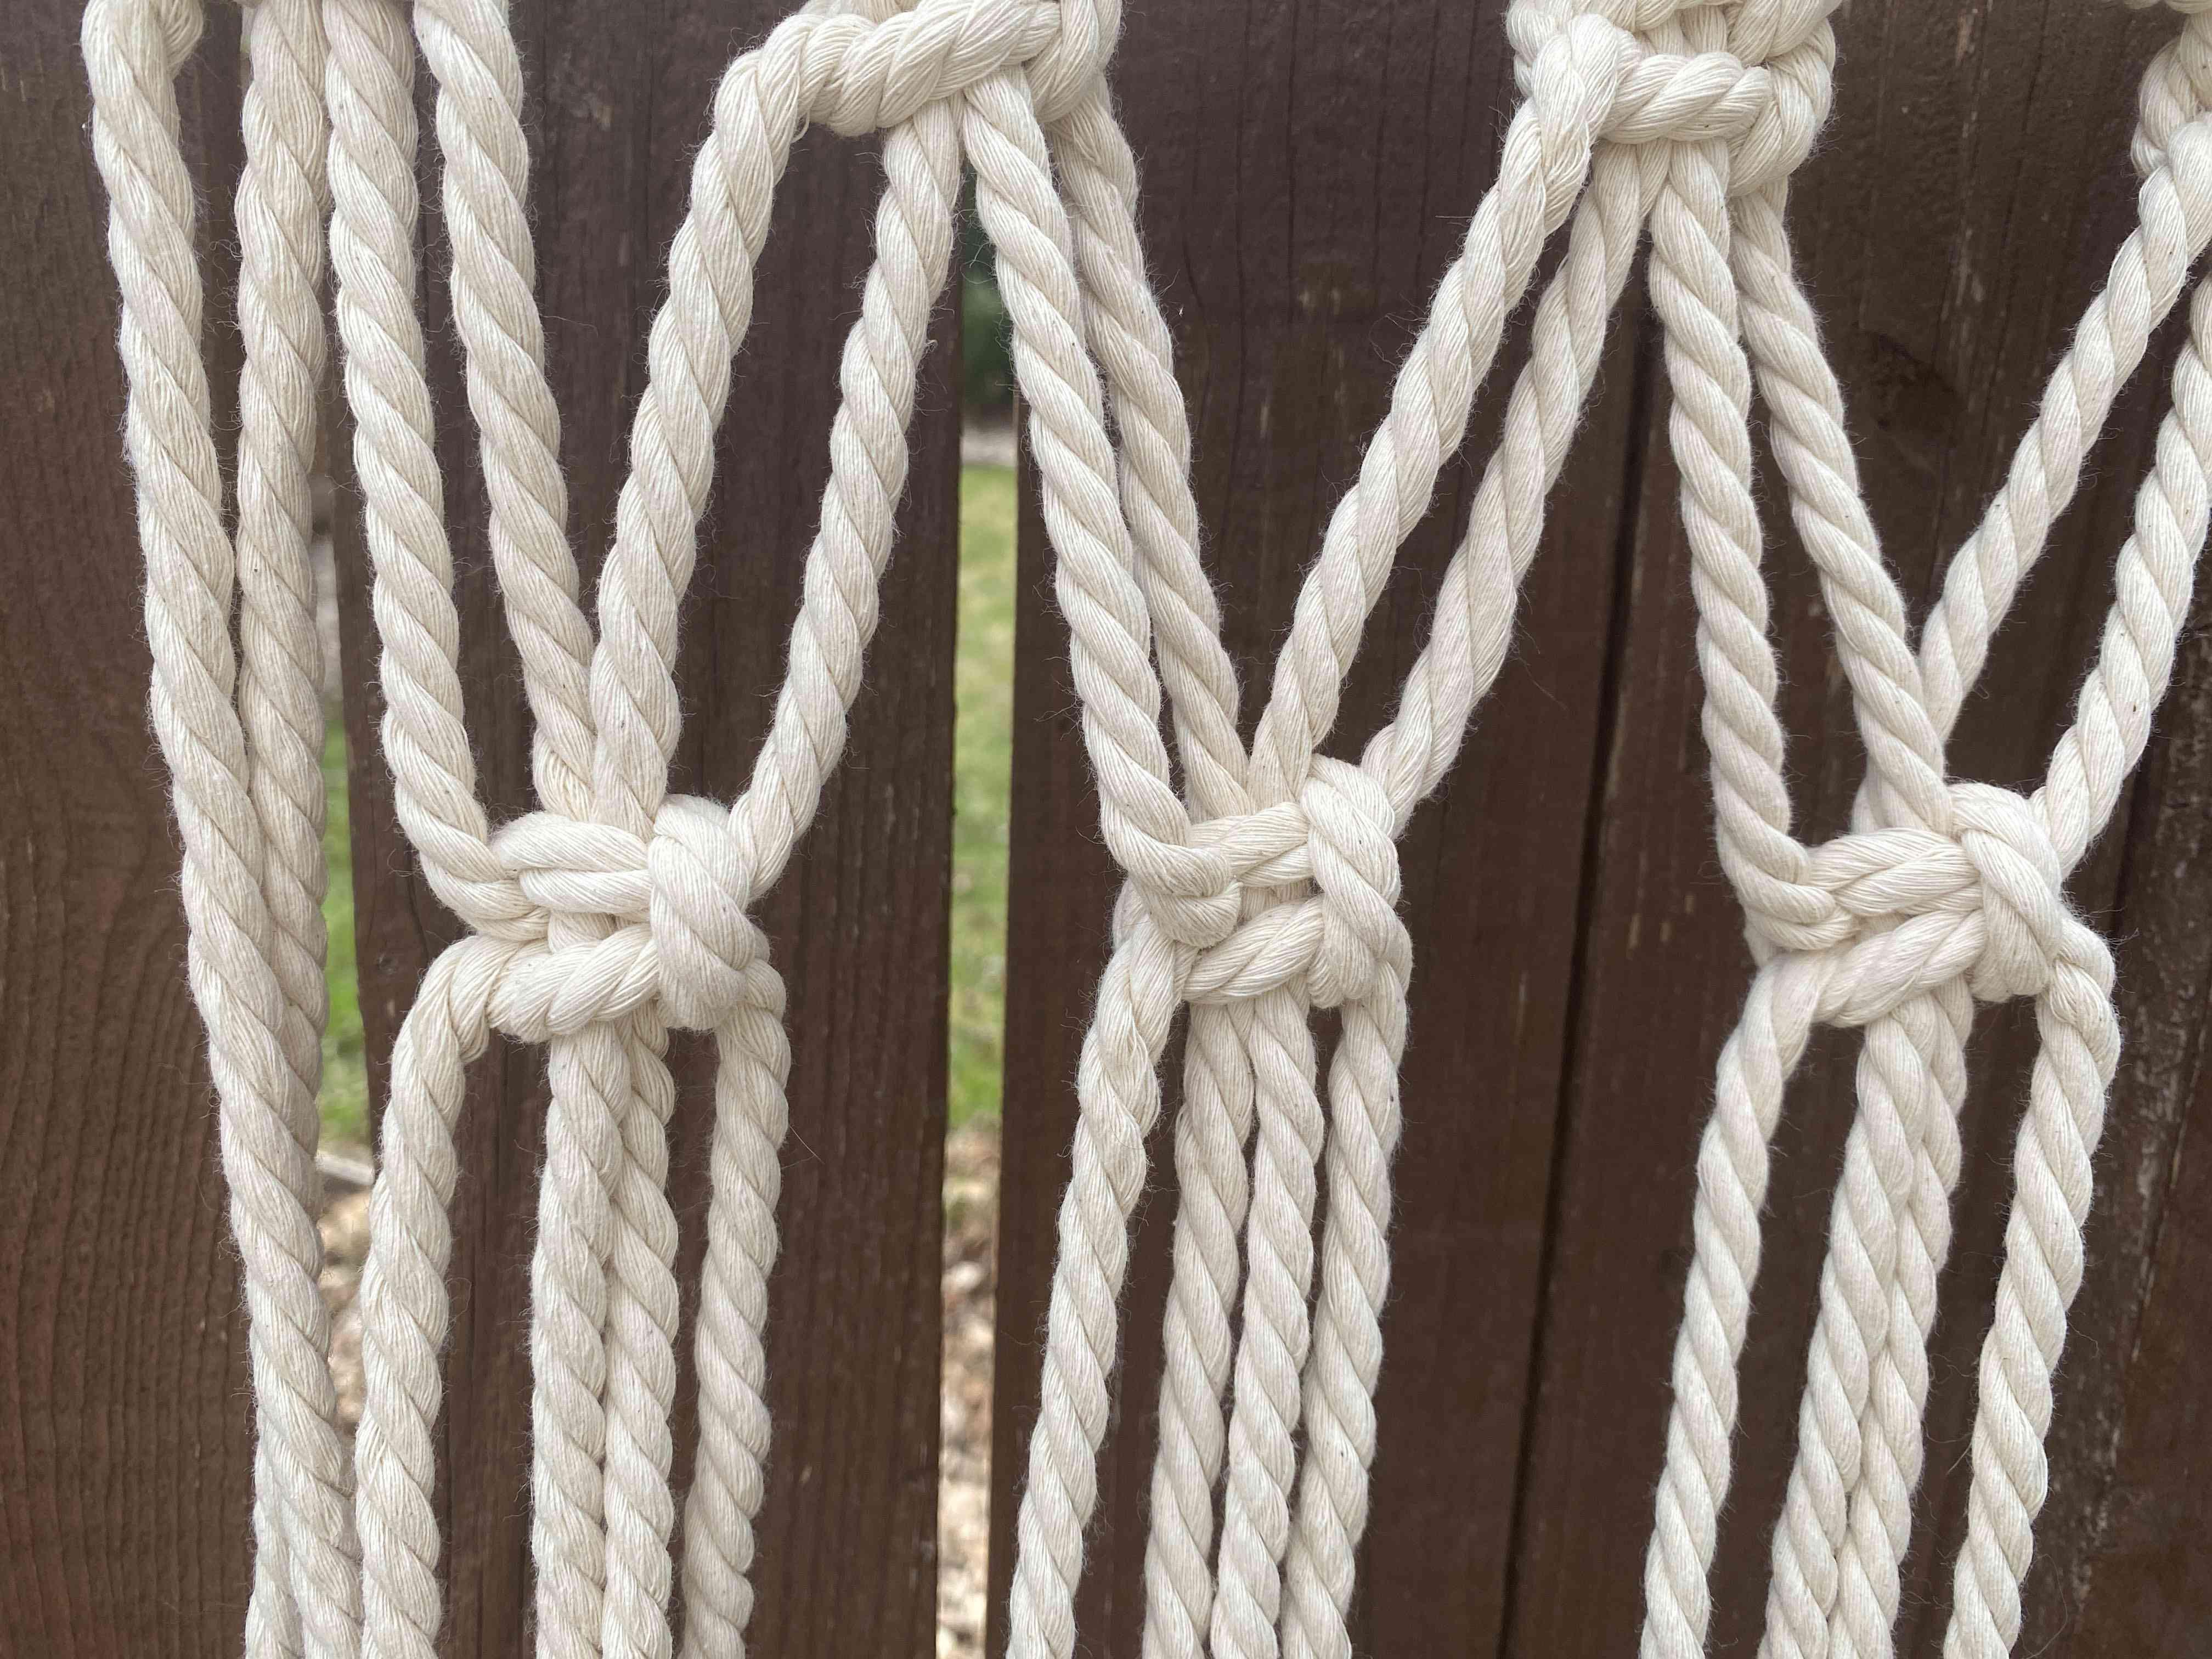 Square macrame knots